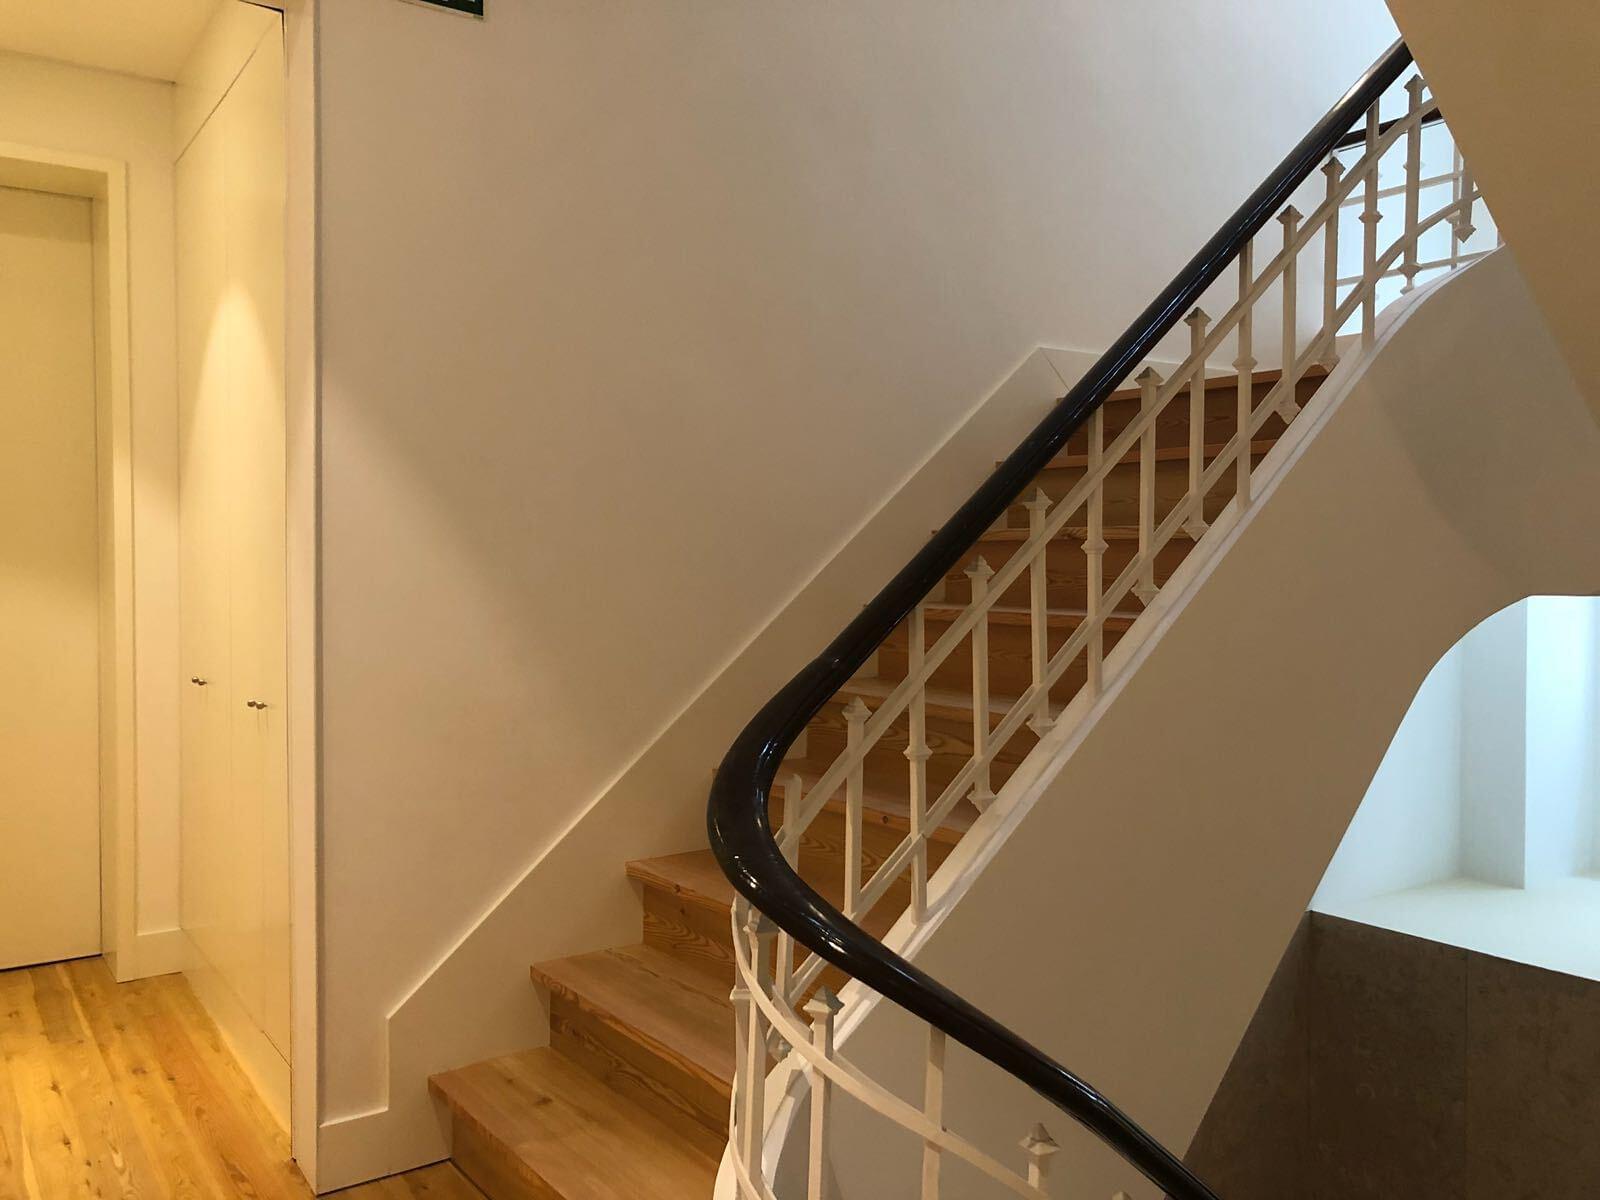 pf17142-apartamento-t2-lisboa-e4a293e9-1916-4bf7-8fe2-94cfc6e00a98